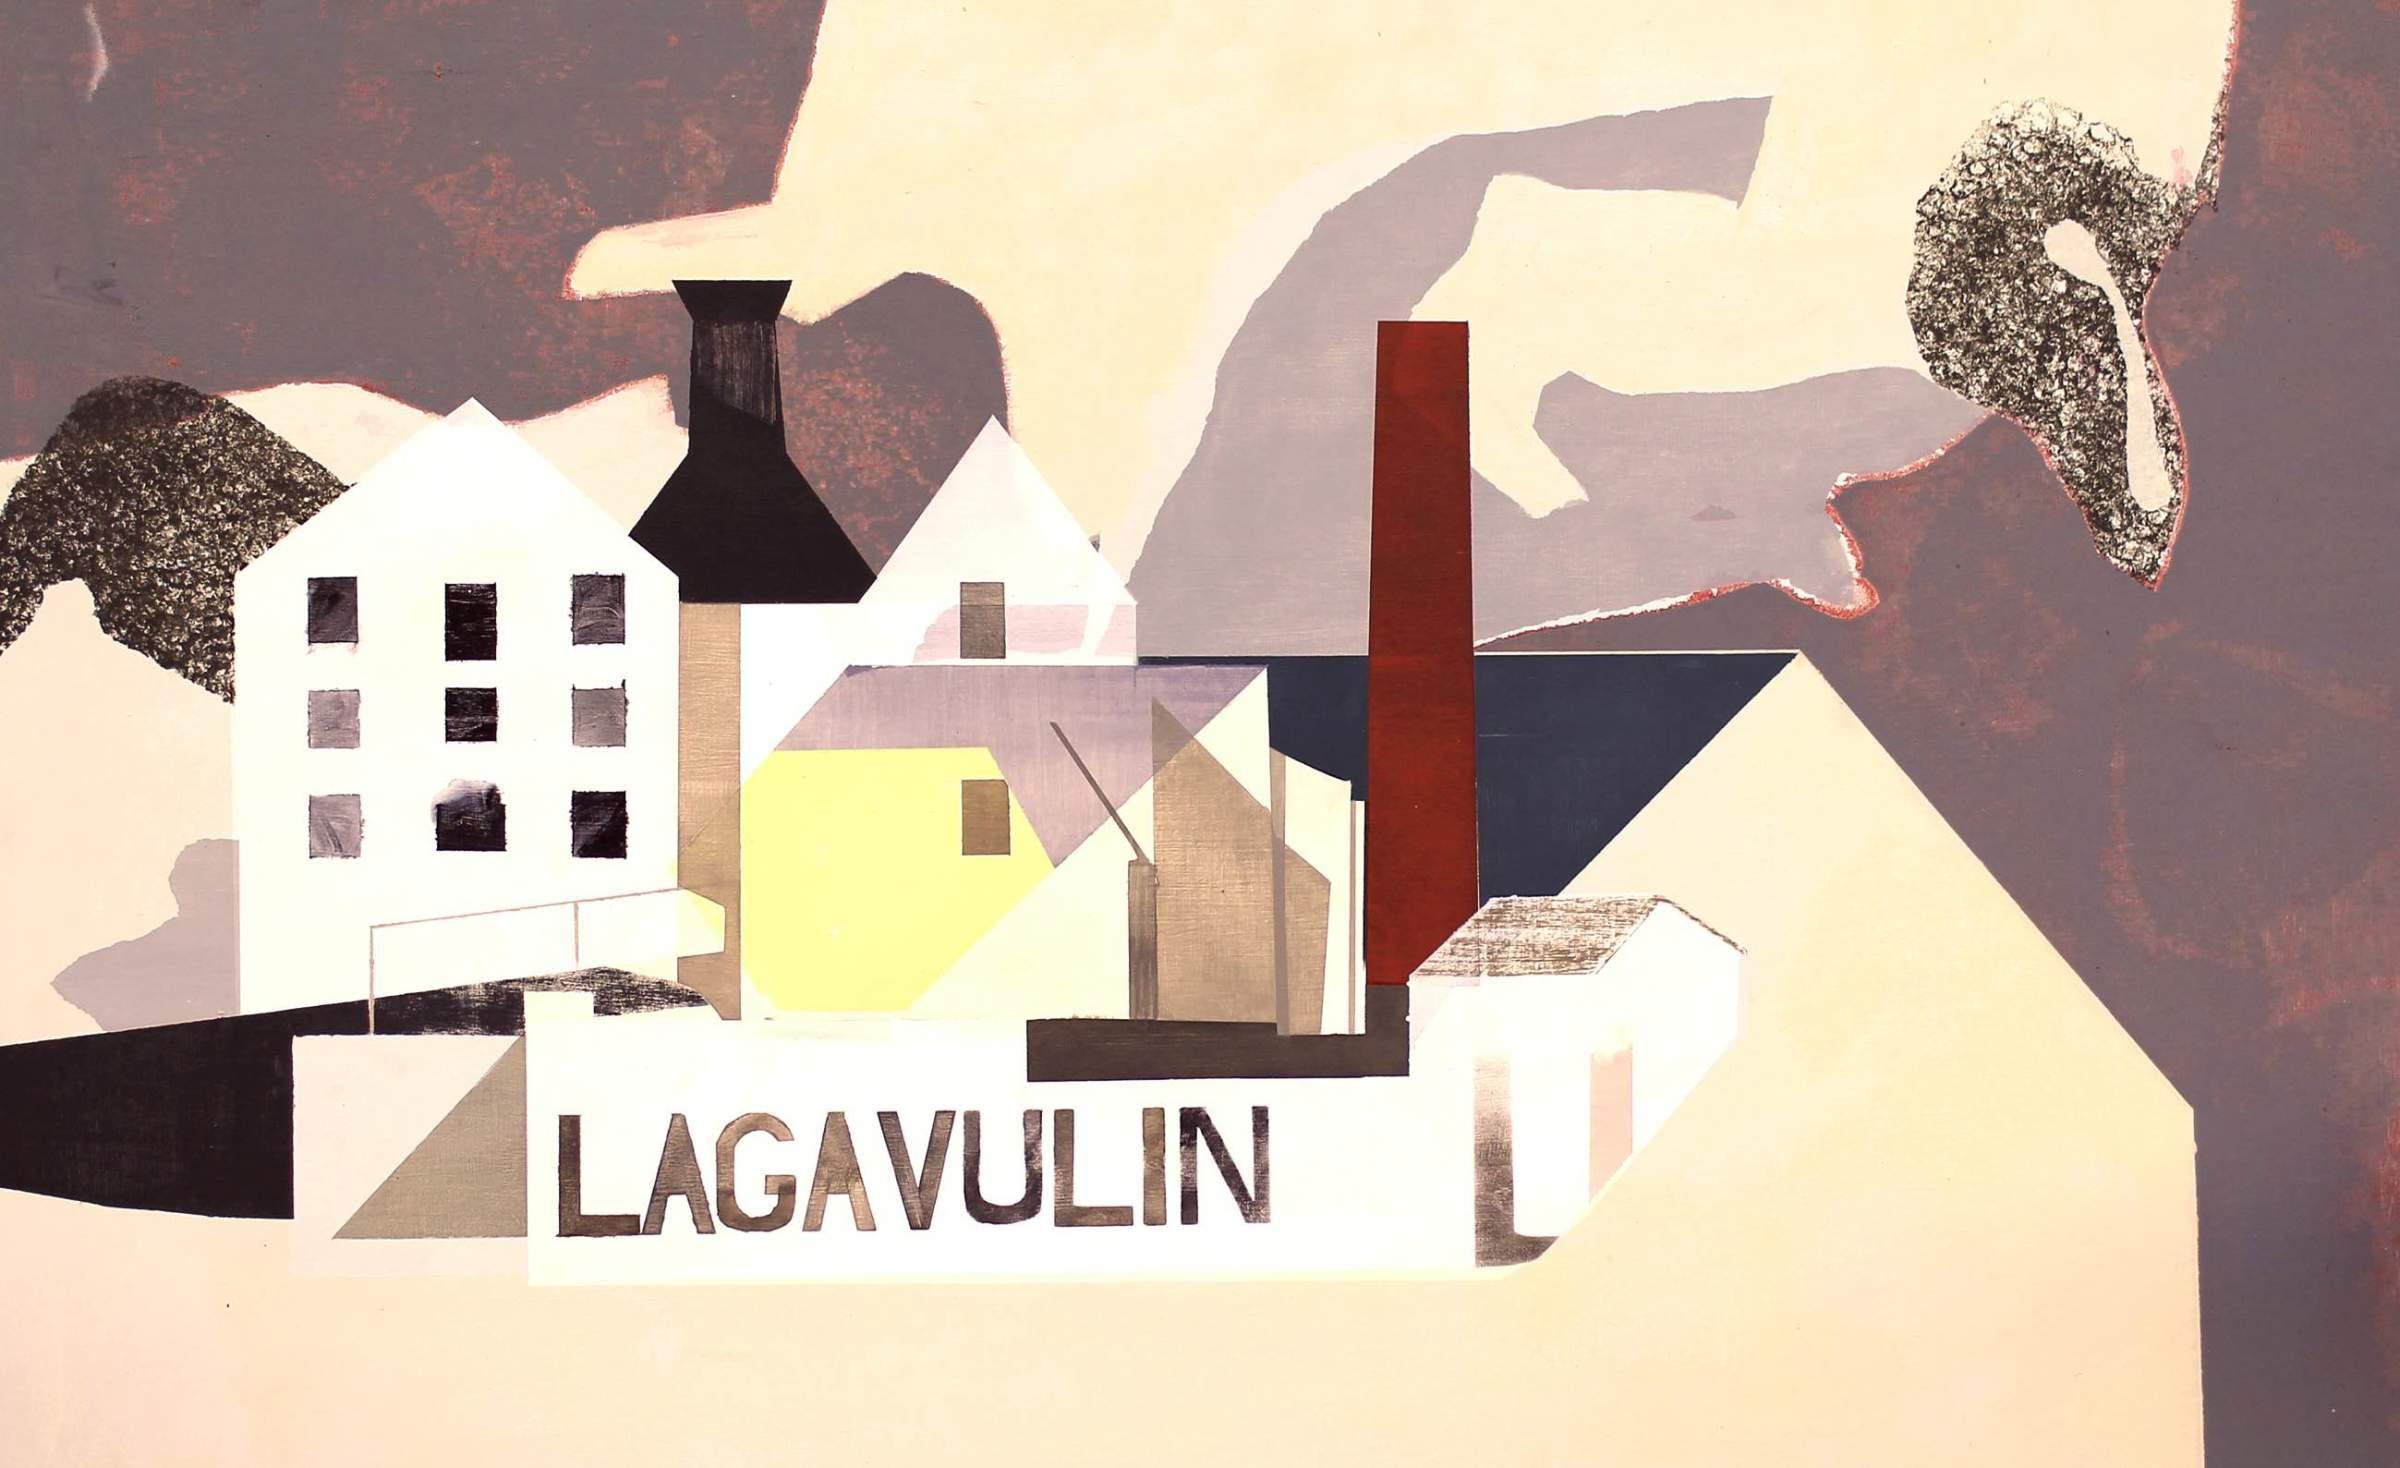 "<span class=""link fancybox-details-link""><a href=""/artists/184-euan-mcgregor/works/2417-euan-mcgregor-lagavulin/"">View Detail Page</a></span><div class=""artist""><strong>Euan McGregor</strong></div> <div class=""title""><em>Lagavulin </em></div> <div class=""medium"">Acrylic on Board (framed)</div> <div class=""dimensions"">57 x 90 cm </div><div class=""price"">£2,900.00</div><div class=""copyright_line"">Copyright The Artist</div>"